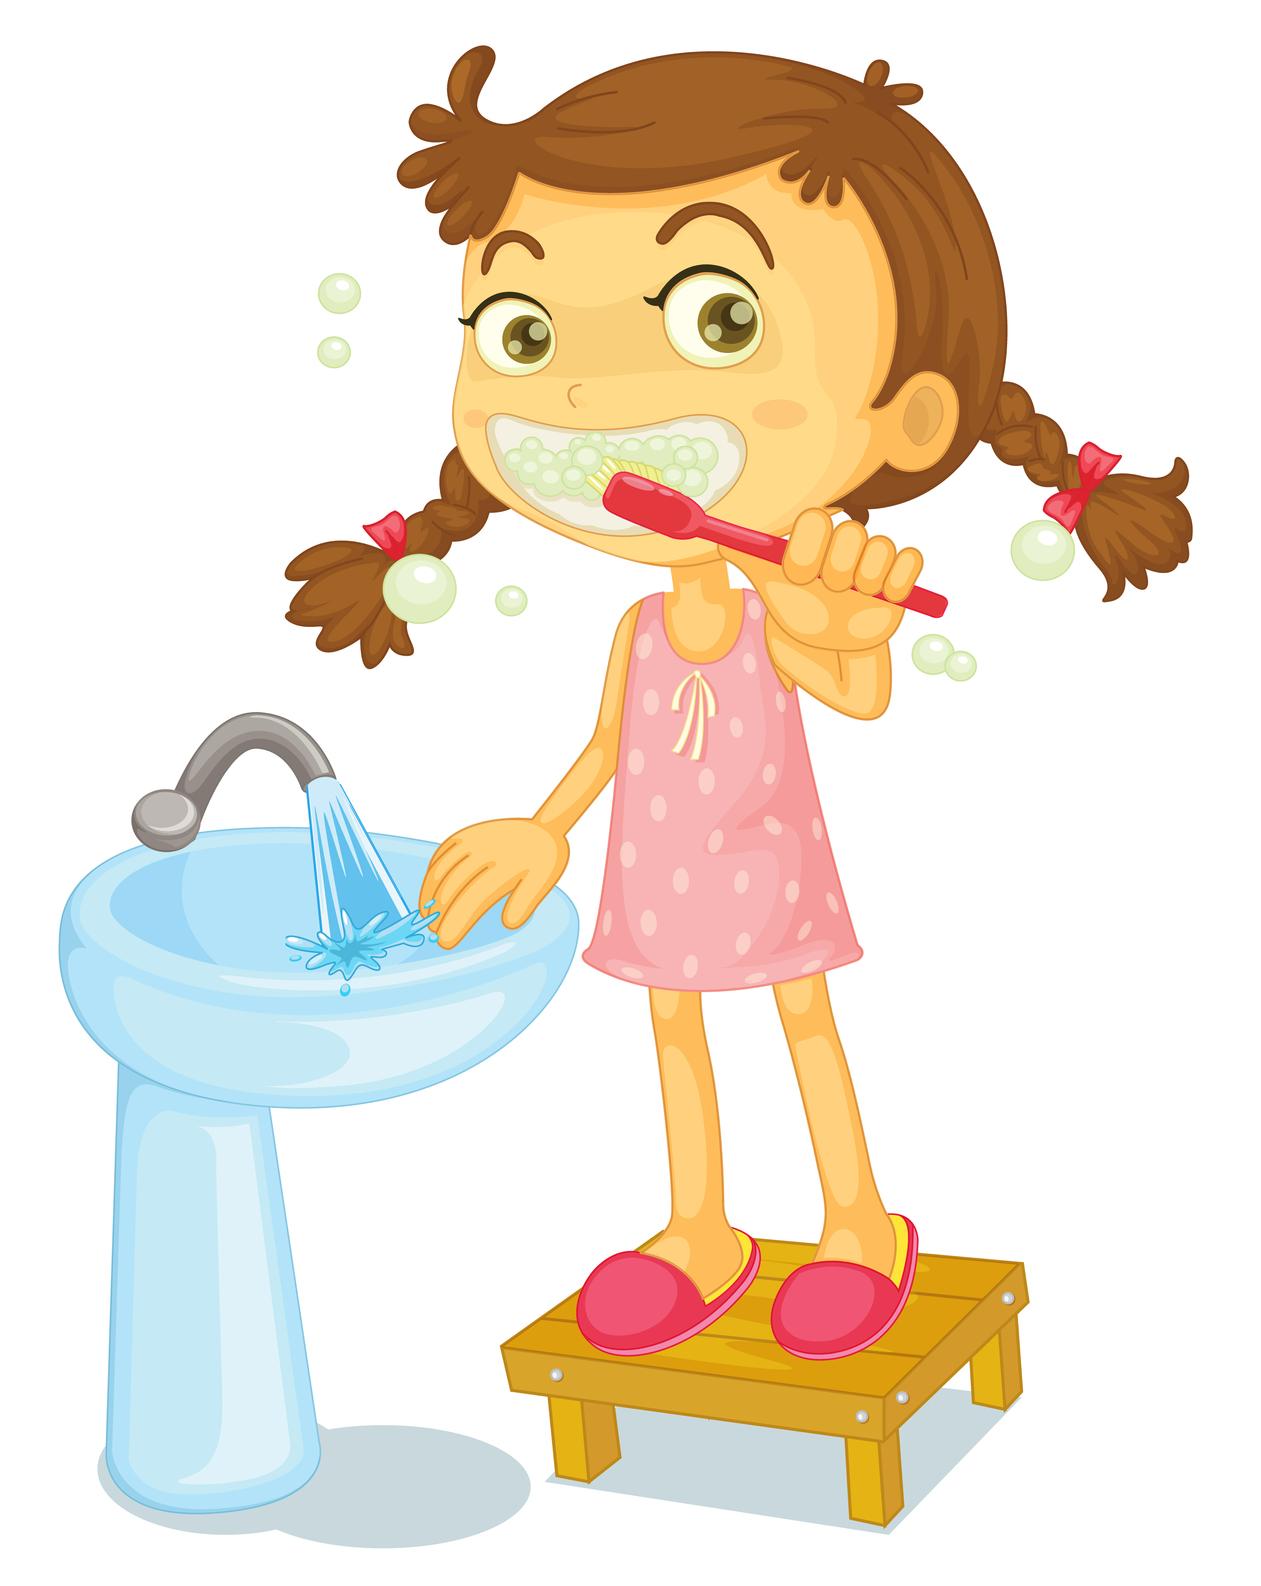 Brush my teeth clipart.